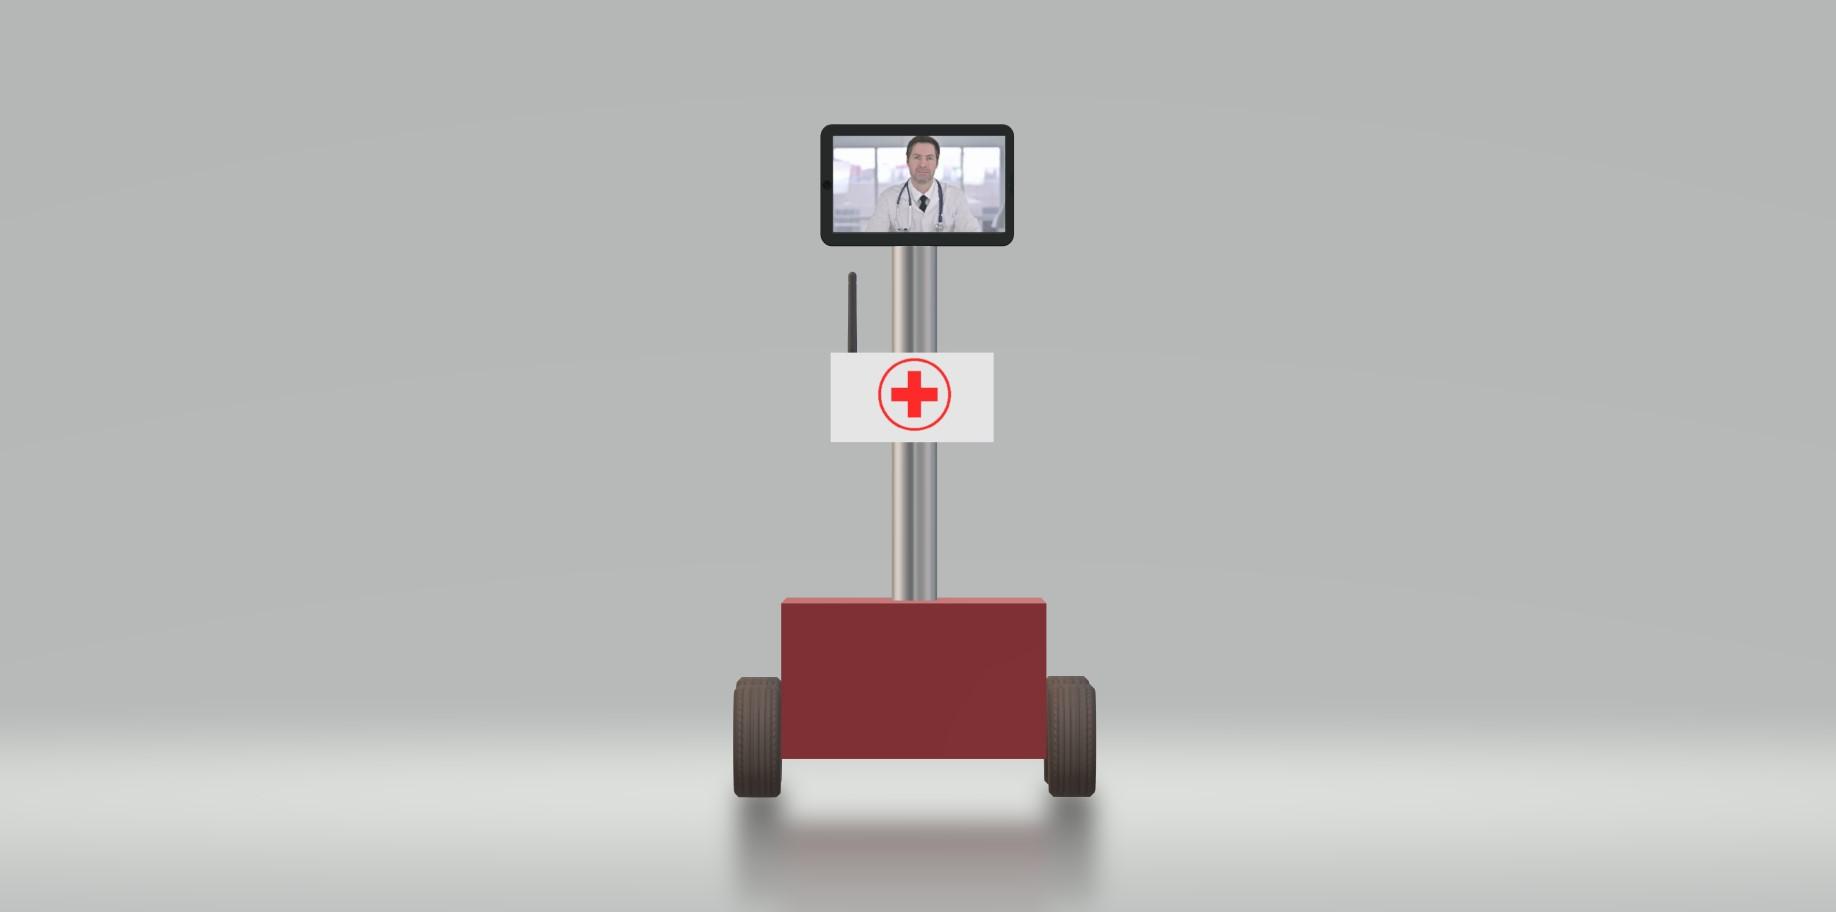 Nevon iot virtual doctor robot